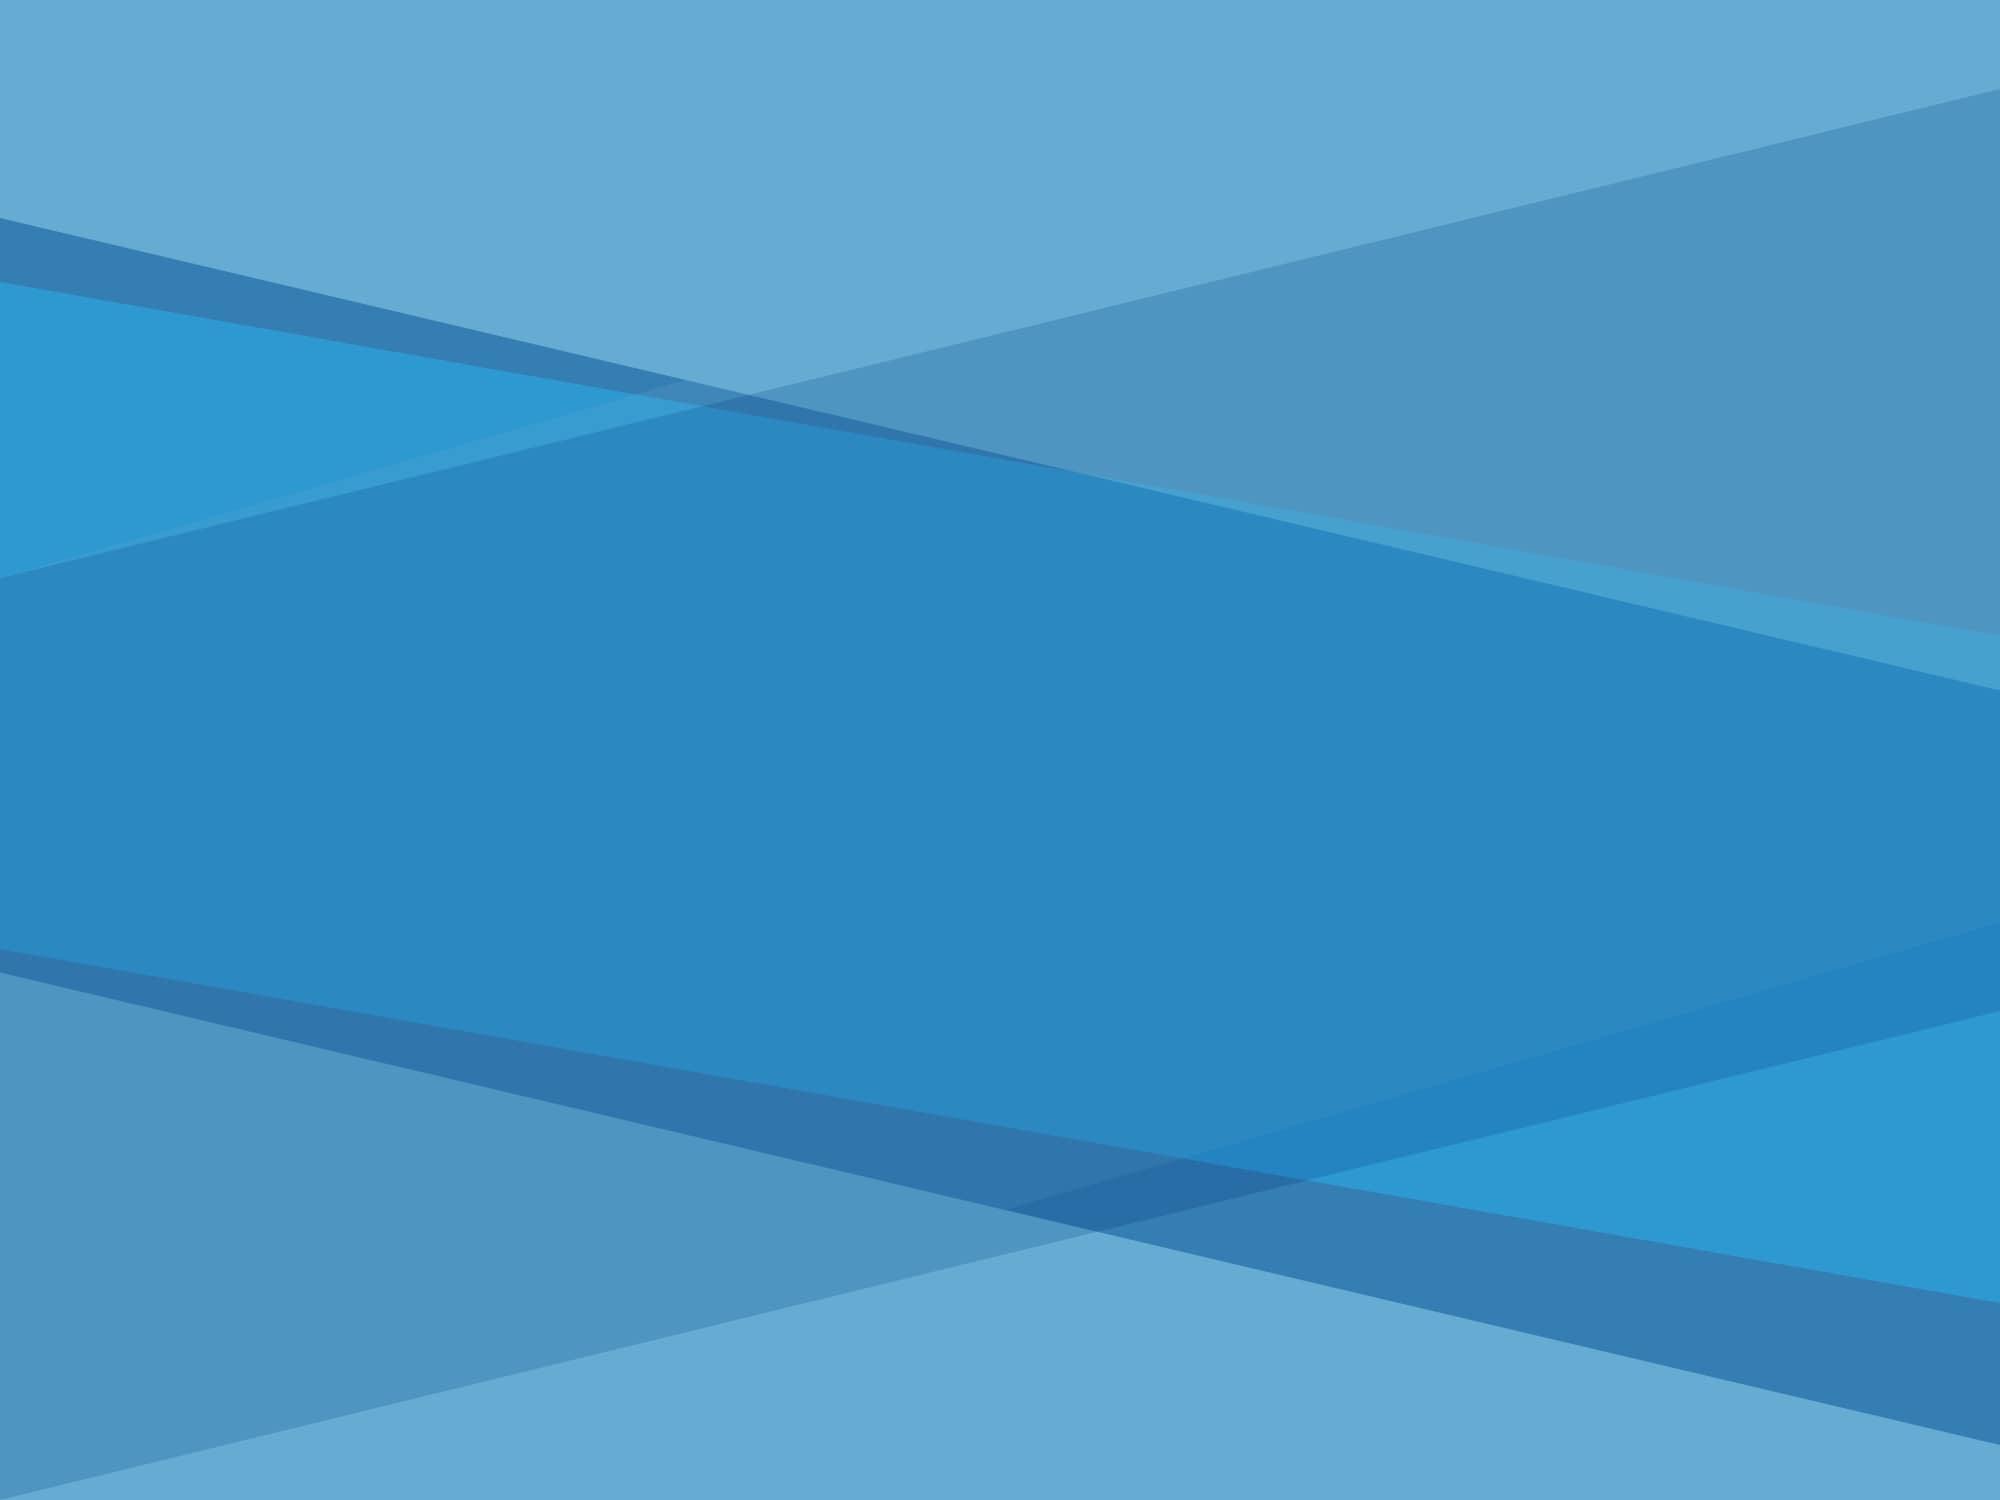 Diagonal screens texture sky blue